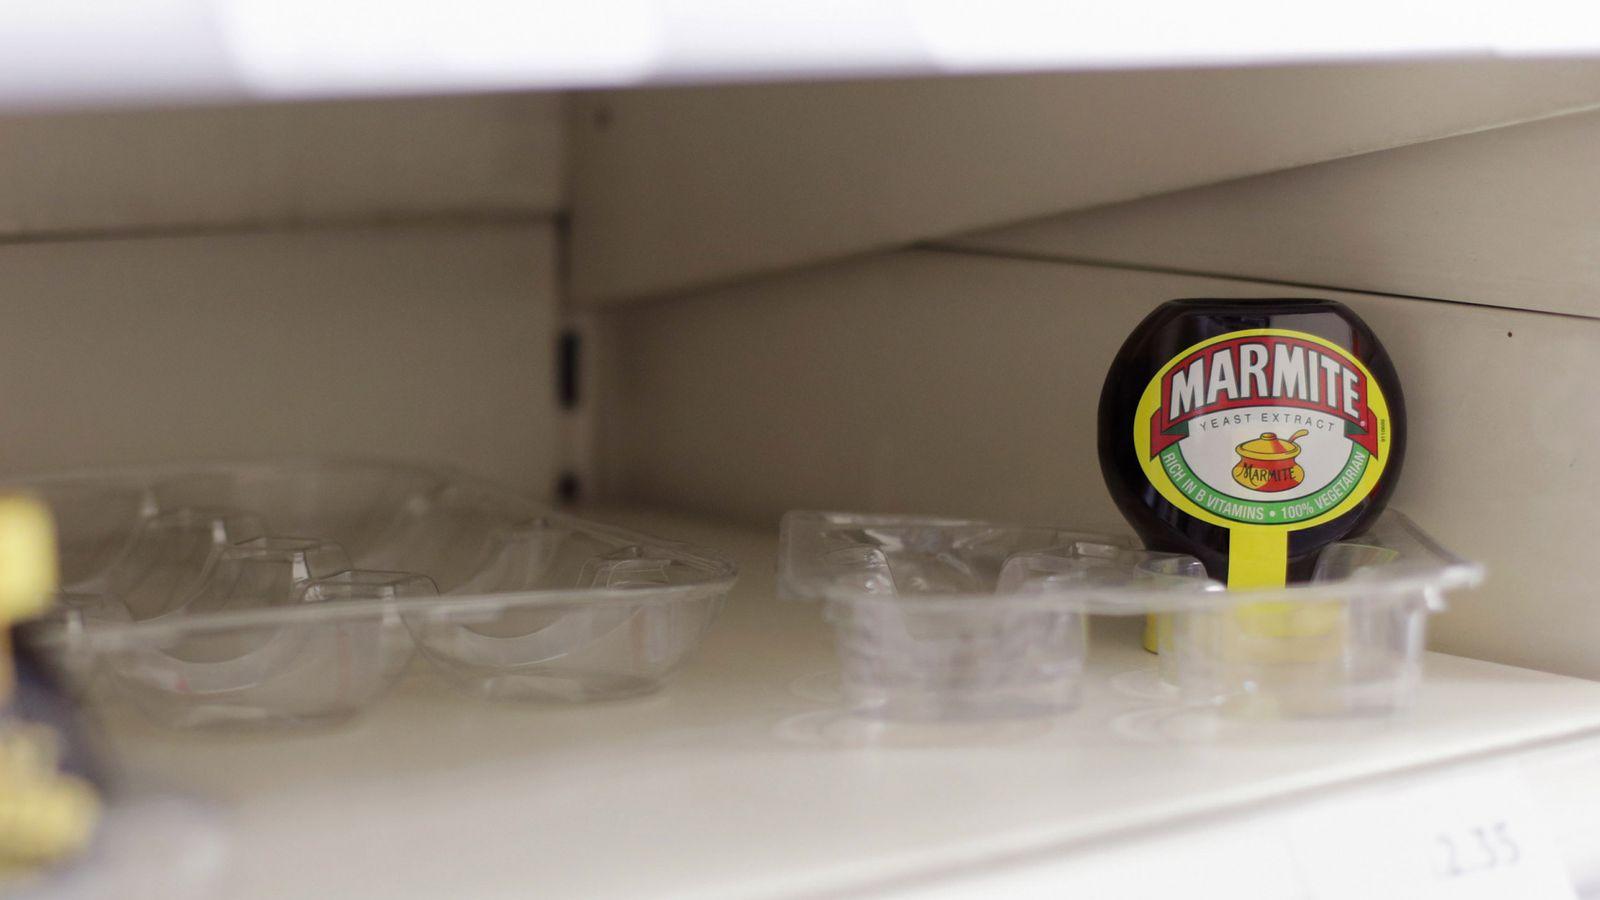 skynews marmite yeast extract 5010829 jpg?20200611095128.